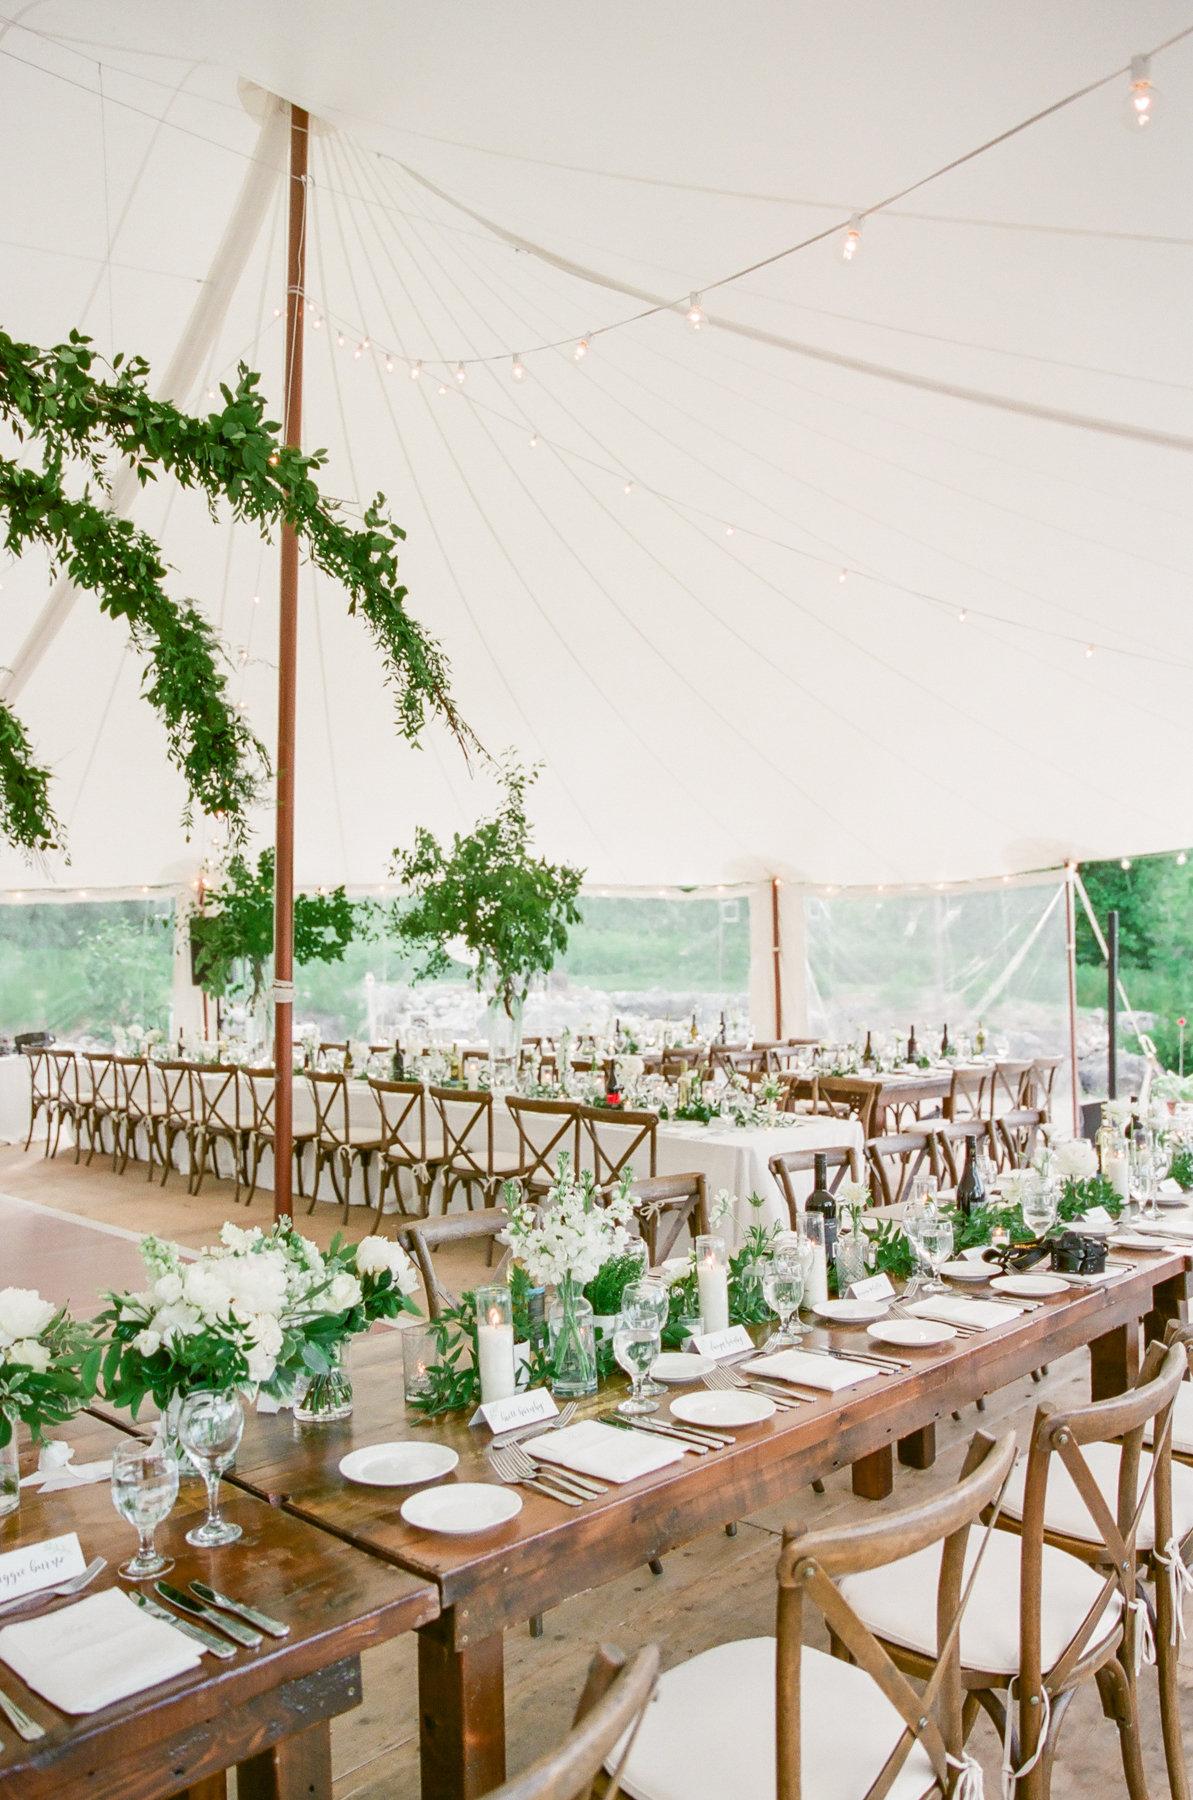 0802-maggiebrett-private-estate-wedding-000006320009.jpg